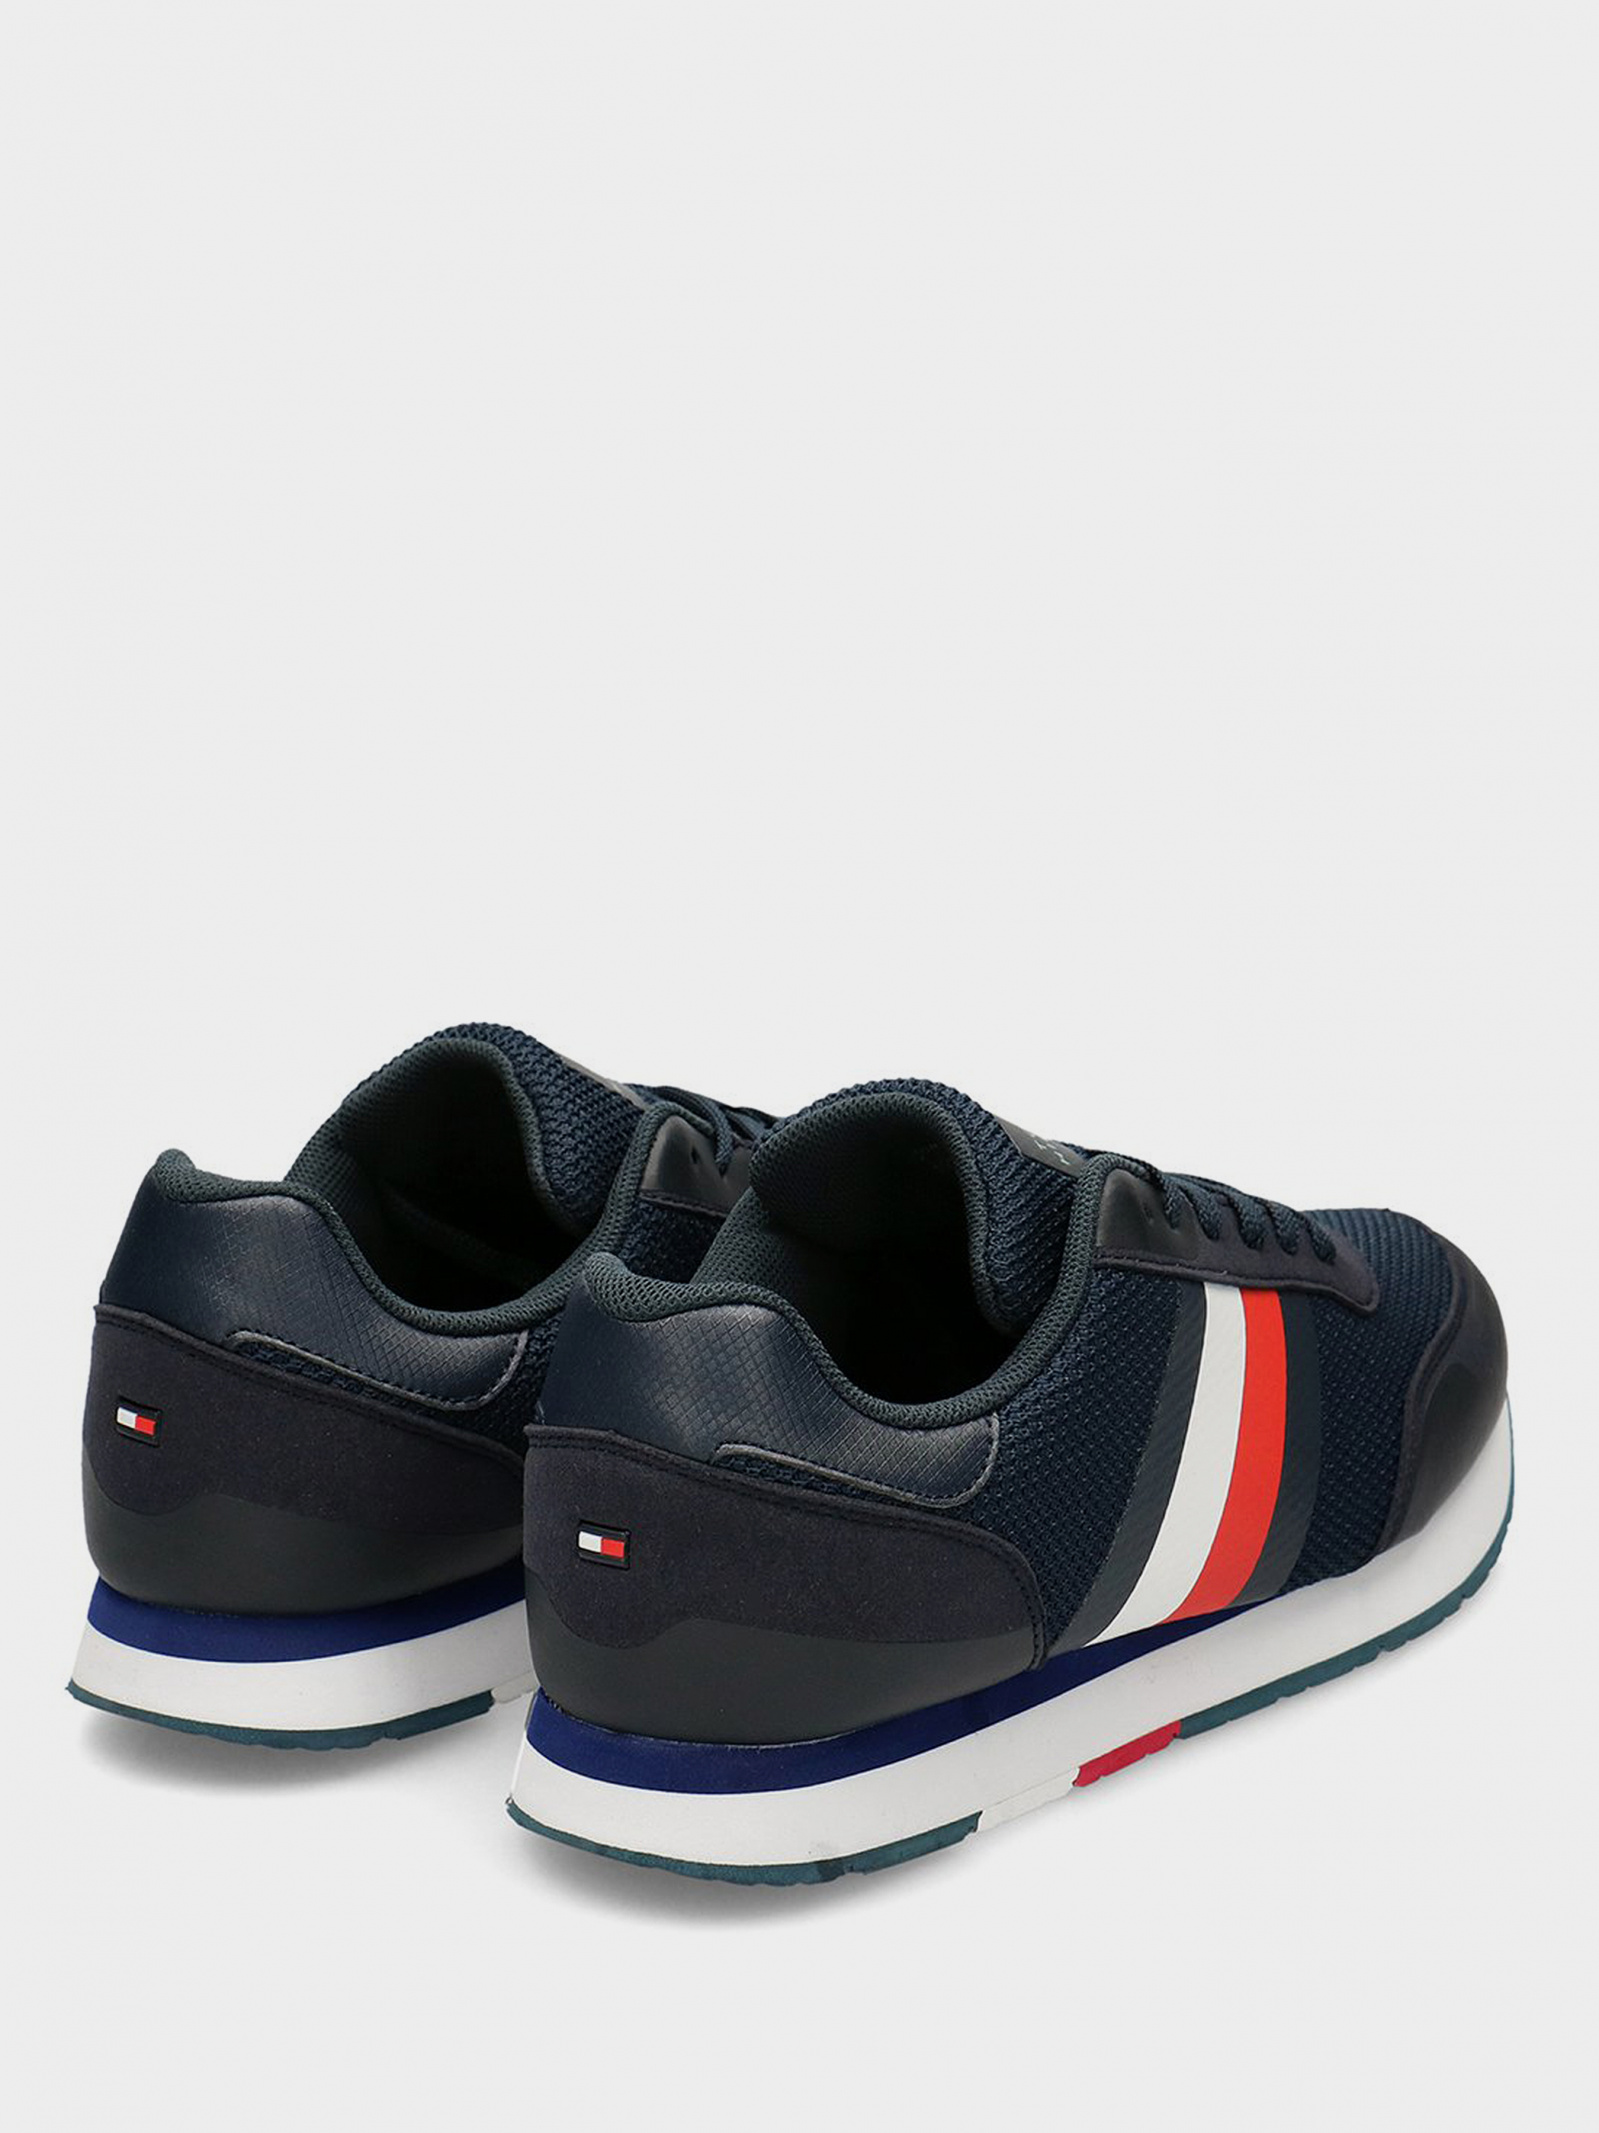 Кроссовки для мужчин Tommy Hilfiger CORPORATE MATERIAL MIX RUNNER FM0FM02688-DW5 размерная сетка обуви, 2017